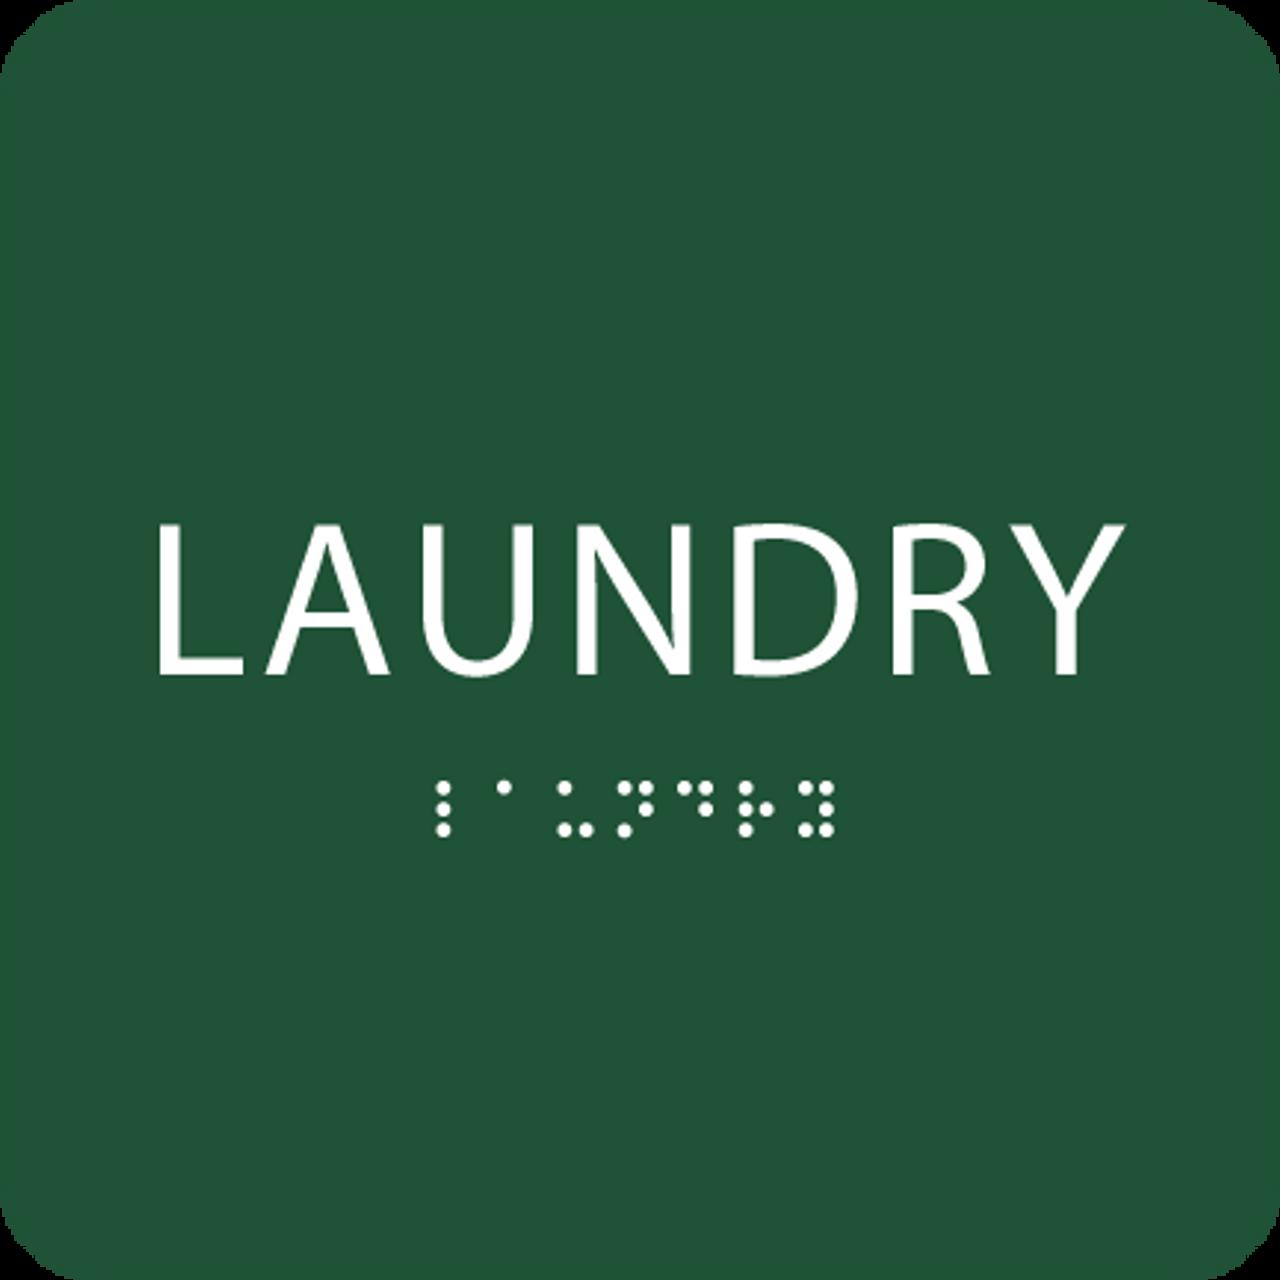 Green Laundry ADA Sign